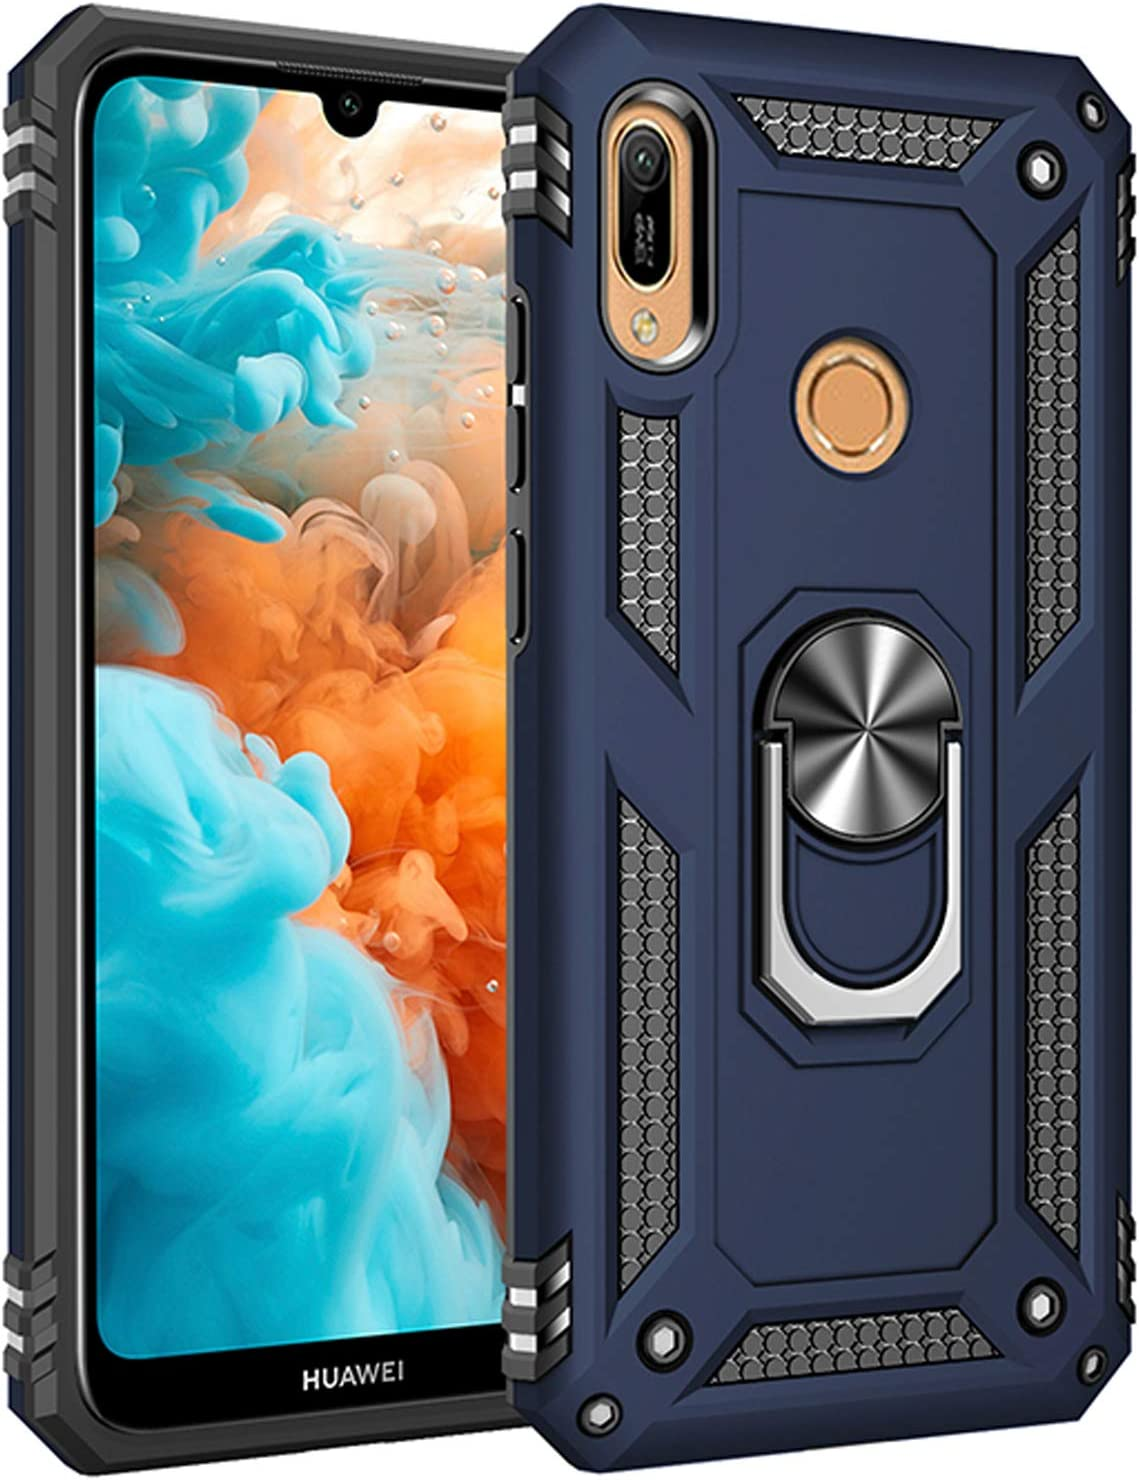 Pegoo Coque Huawei Y6 2019 Y6 Pro 2019 Noir Honor 8A Housse ...